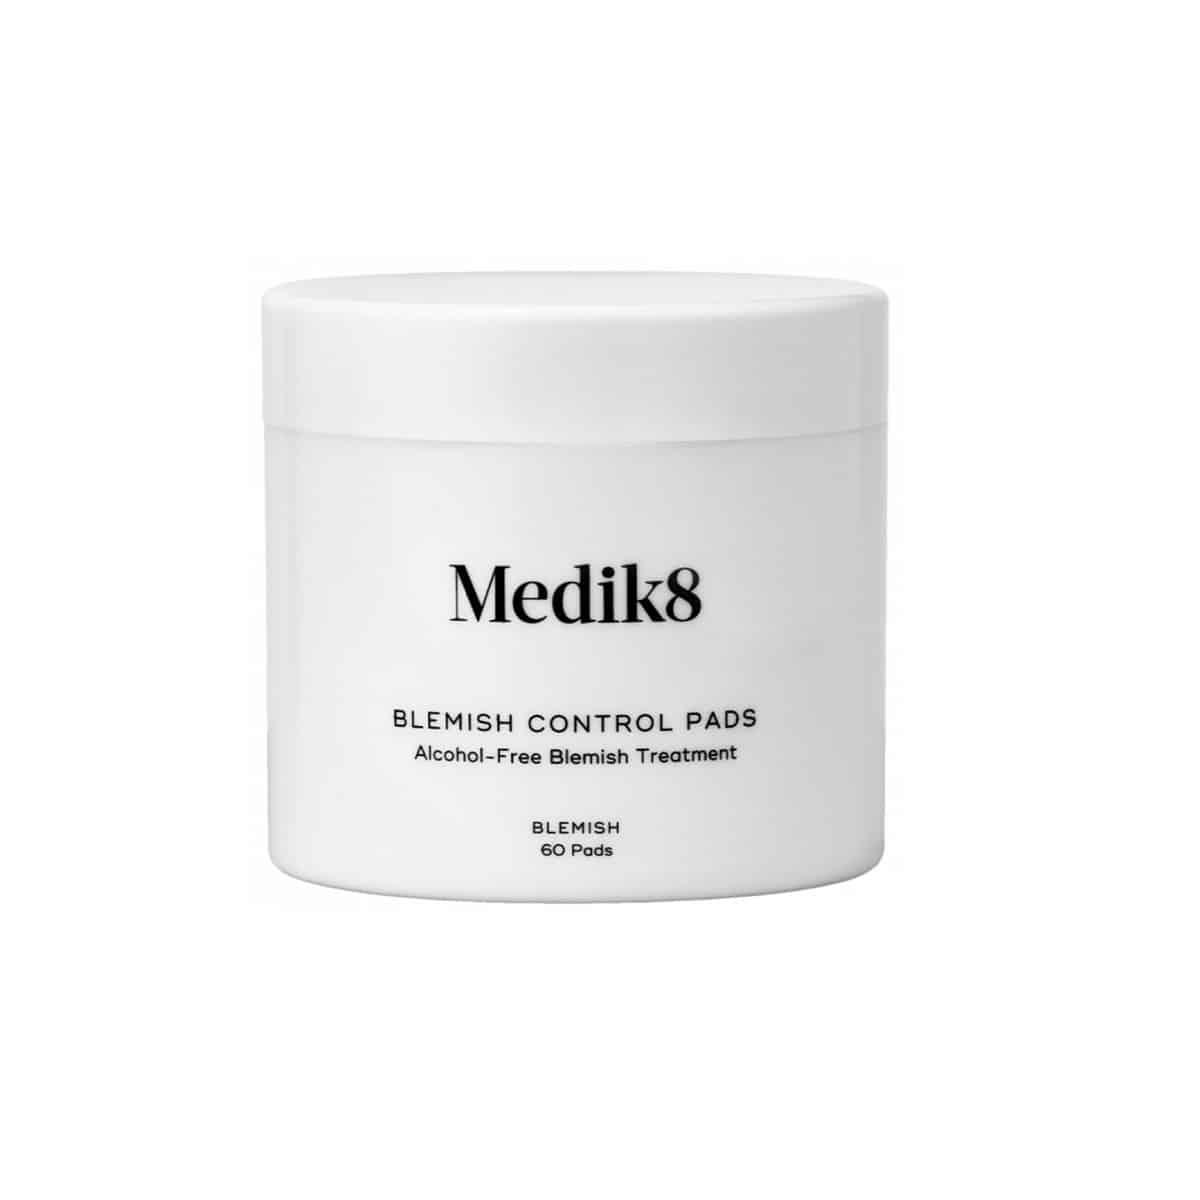 Medik8 Blemish Control Pads Ireland